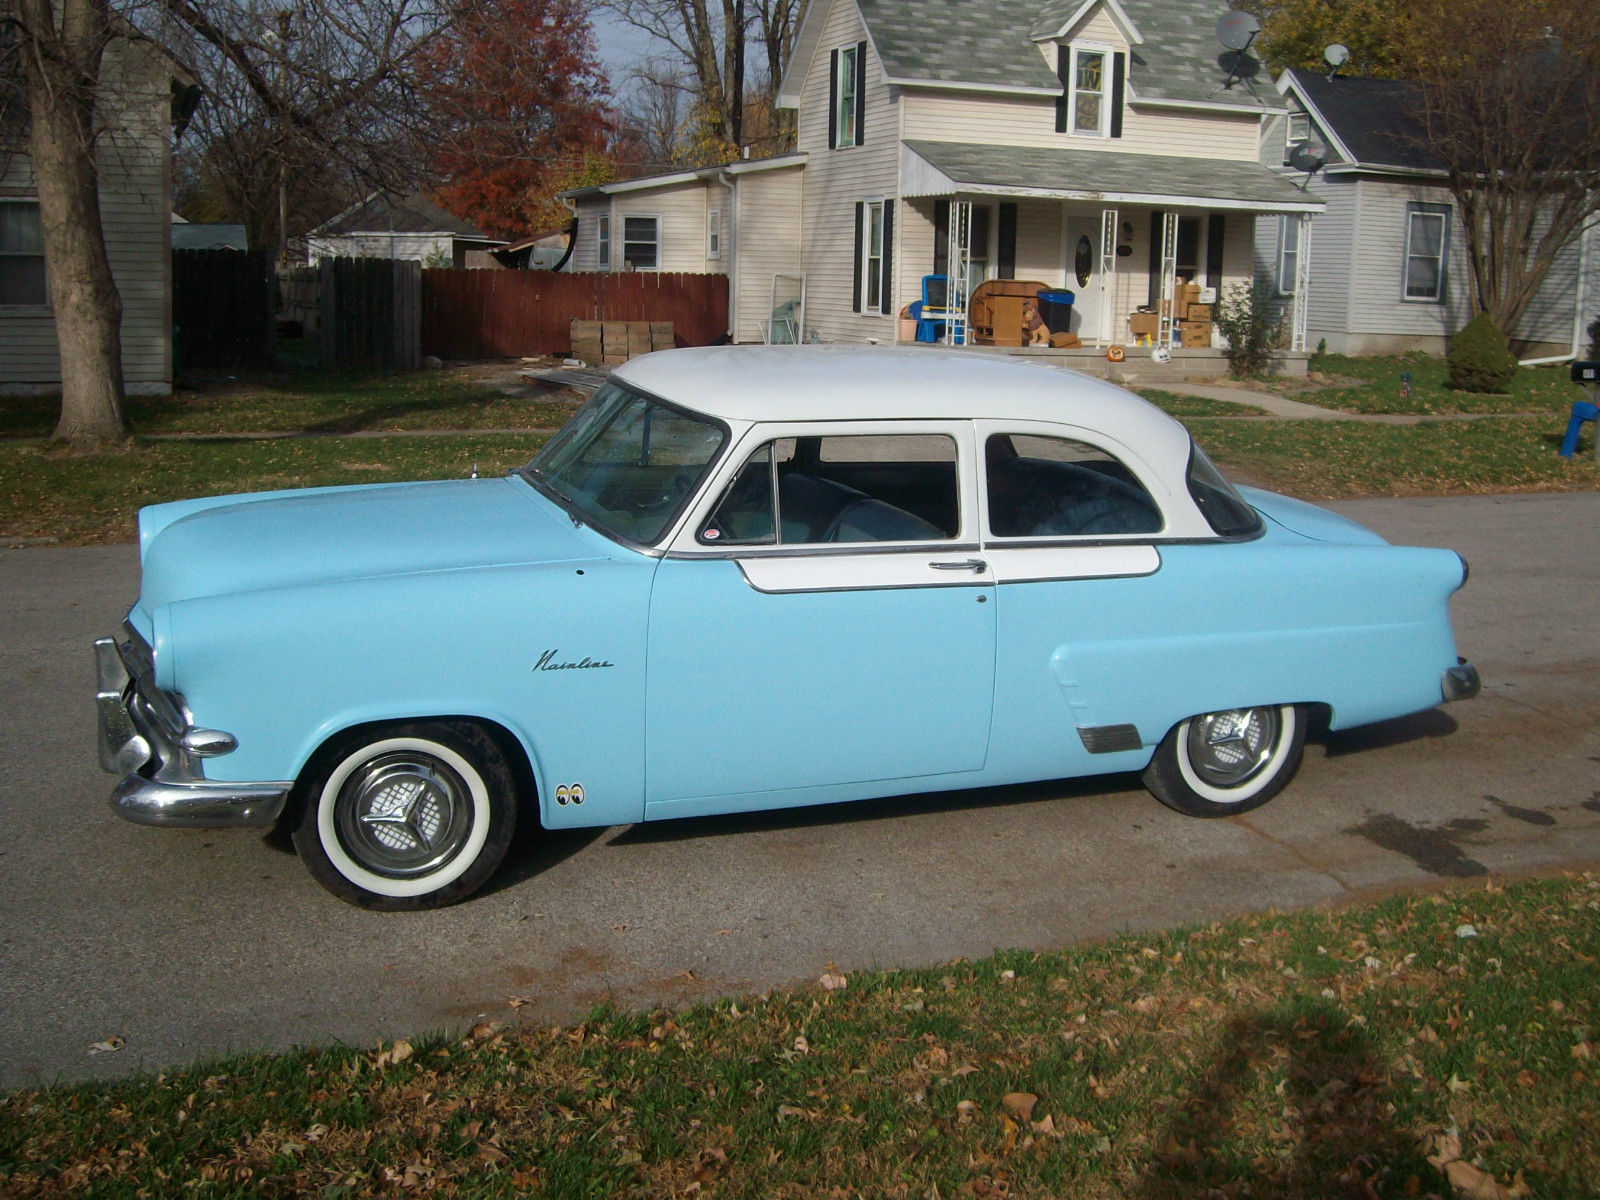 1953 53 Ford Mainline Custom Hot Rod 2 Door Sedan Cruiser Classic 1954 Main Line Other For Sale